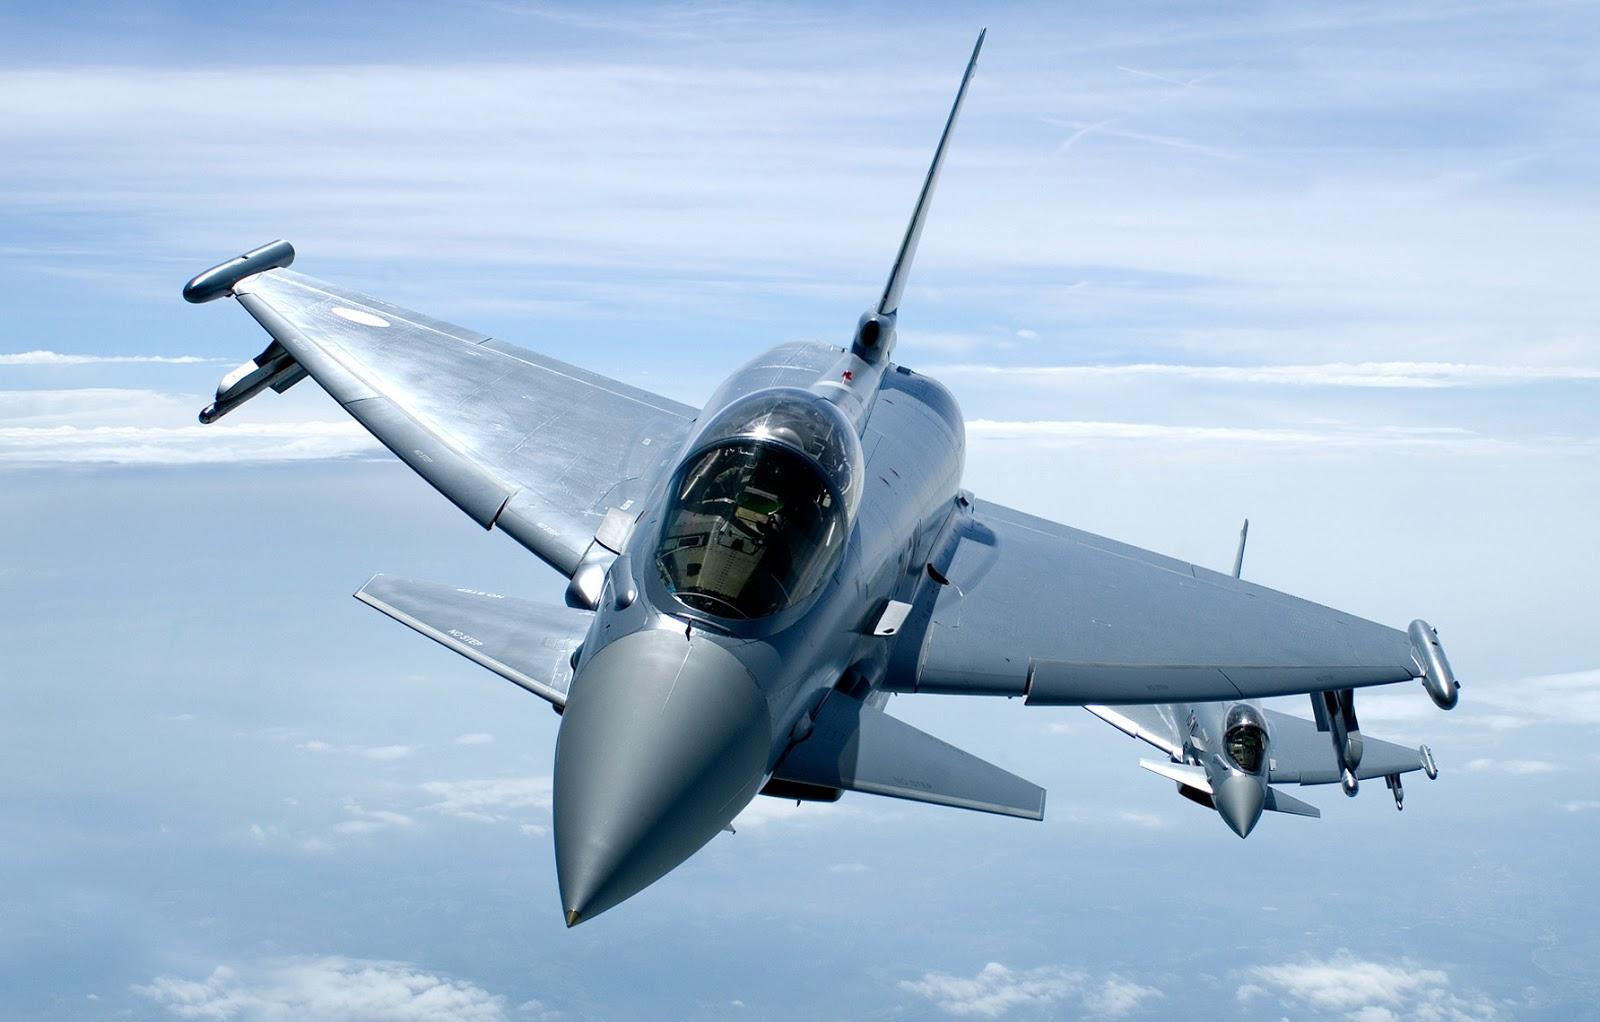 http://2.bp.blogspot.com/-TDOaWctOBAs/UZ6rJHb4WKI/AAAAAAAABkI/Dwl-FZgIK28/s1600/eurofighter_typhoon_desktop_1784x1140_wallpaper-378302.jpg